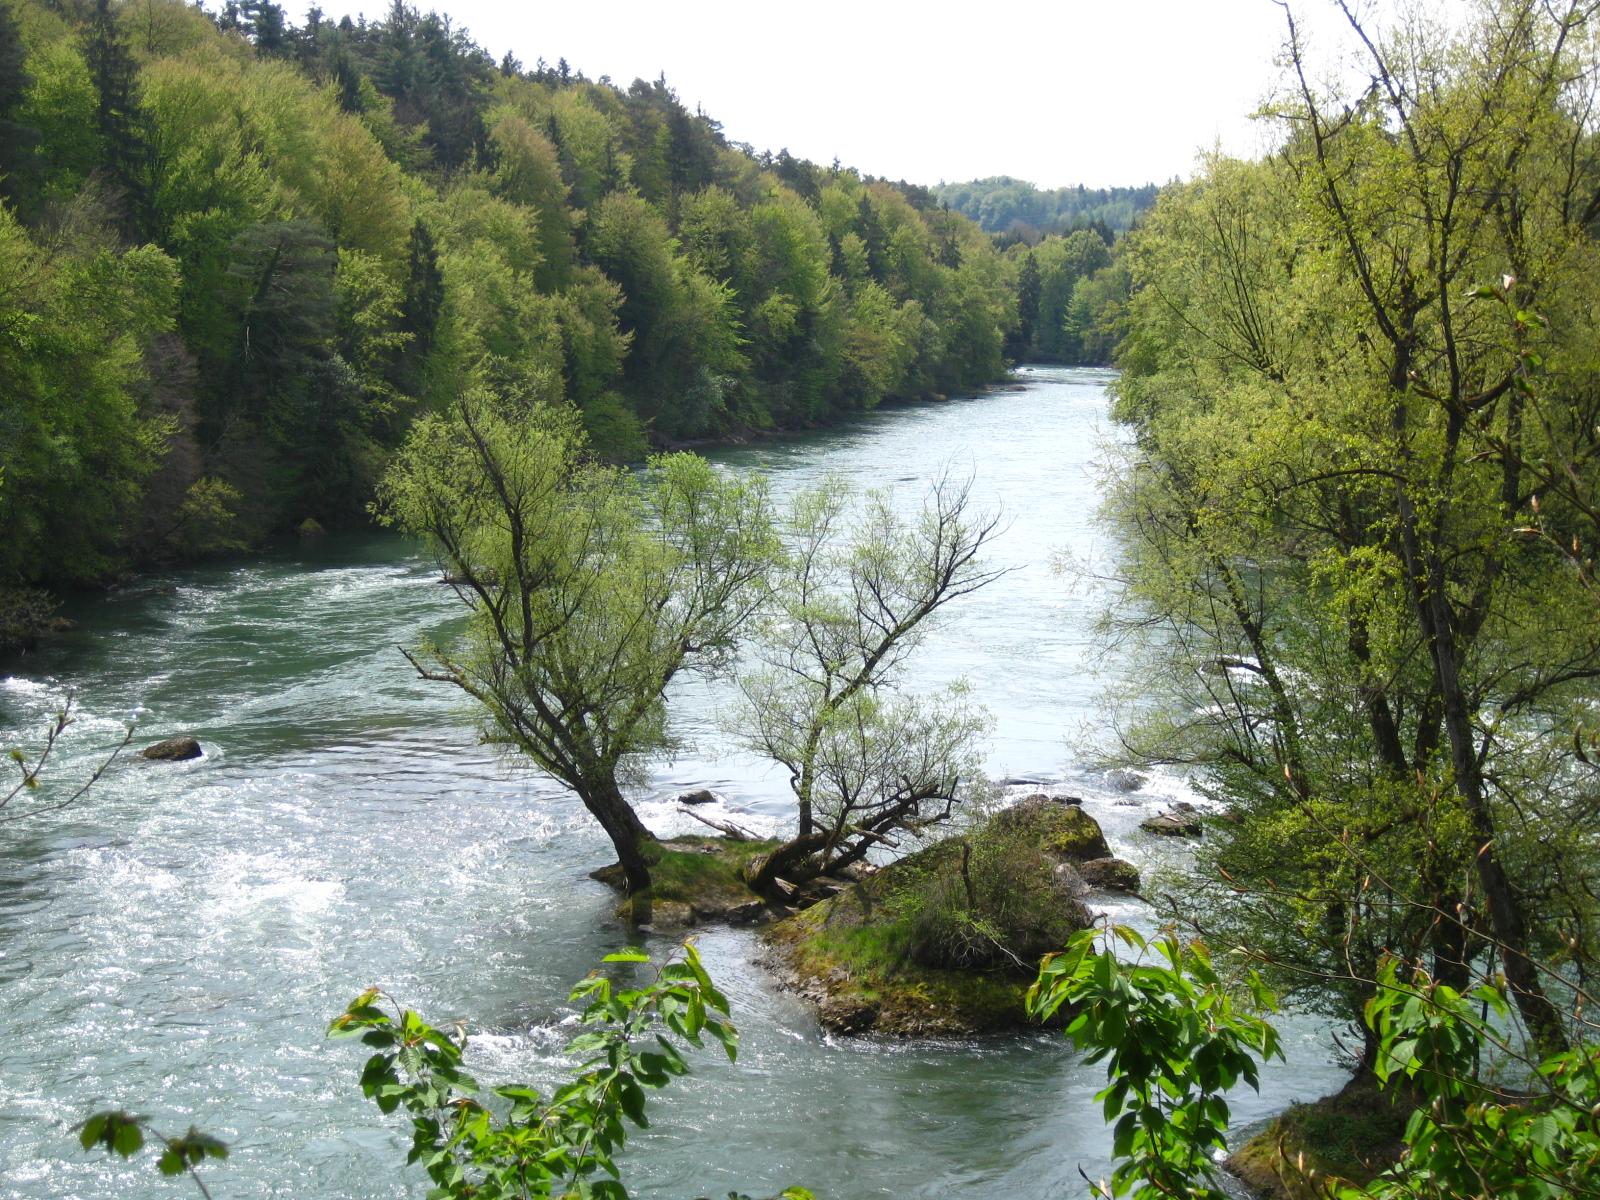 Abschnitt beim Gnadenthal mit den Flussinseln